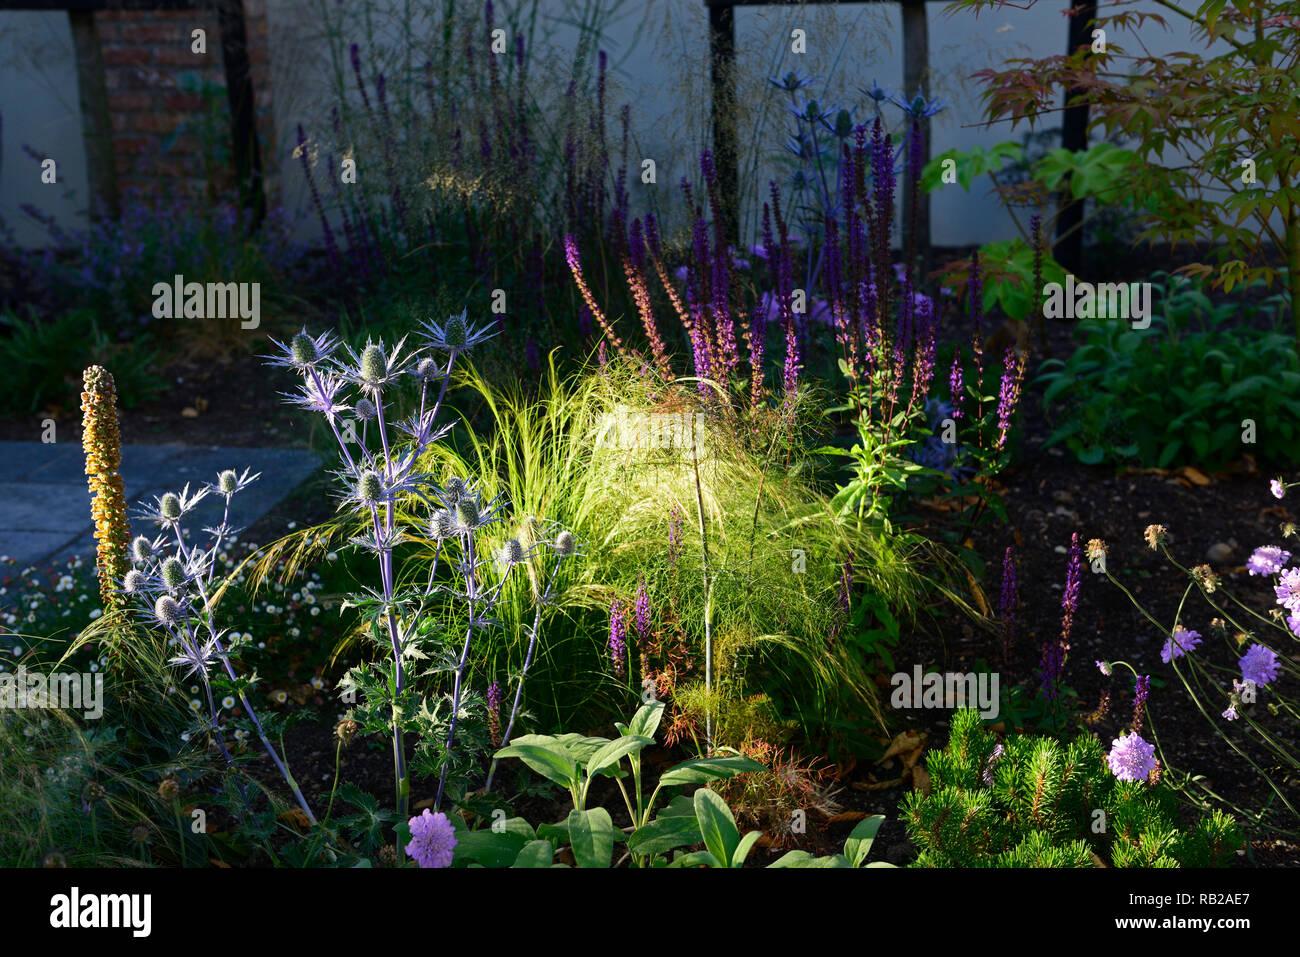 evening sun,illuminates,illuminate,shines,shining,newly planted,mix,mixed,perennial bed,border,scabiosa,eryngium,verbena,acer,gardens,garden design,RM - Stock Image